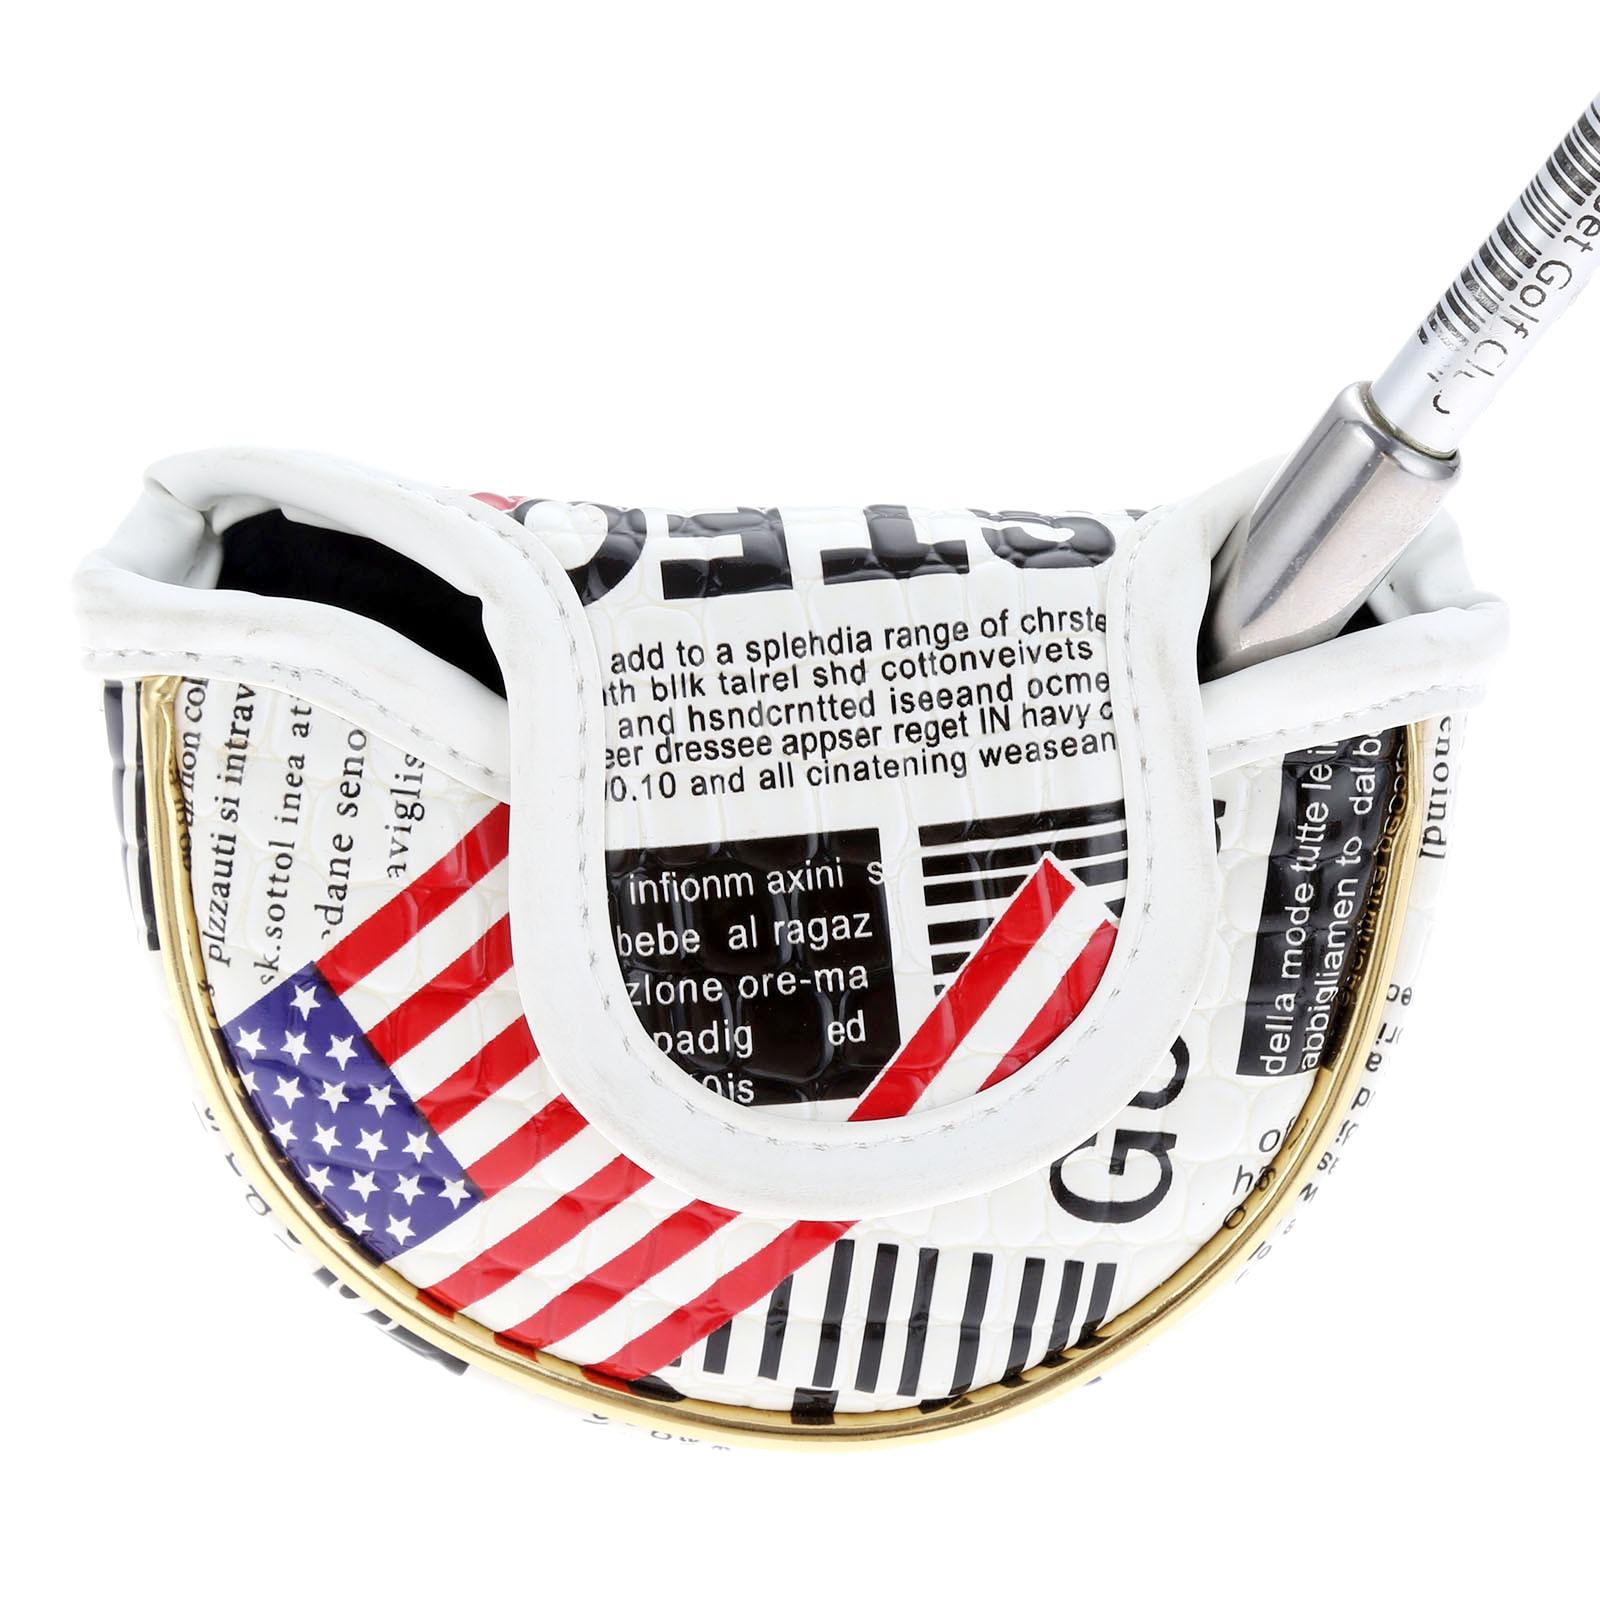 1Pc USA Flag Golf Blade Putter Head Cover PU Waterproof Golf Headcovers For Men Women Golfer Gift Golf Club Heads Accessories